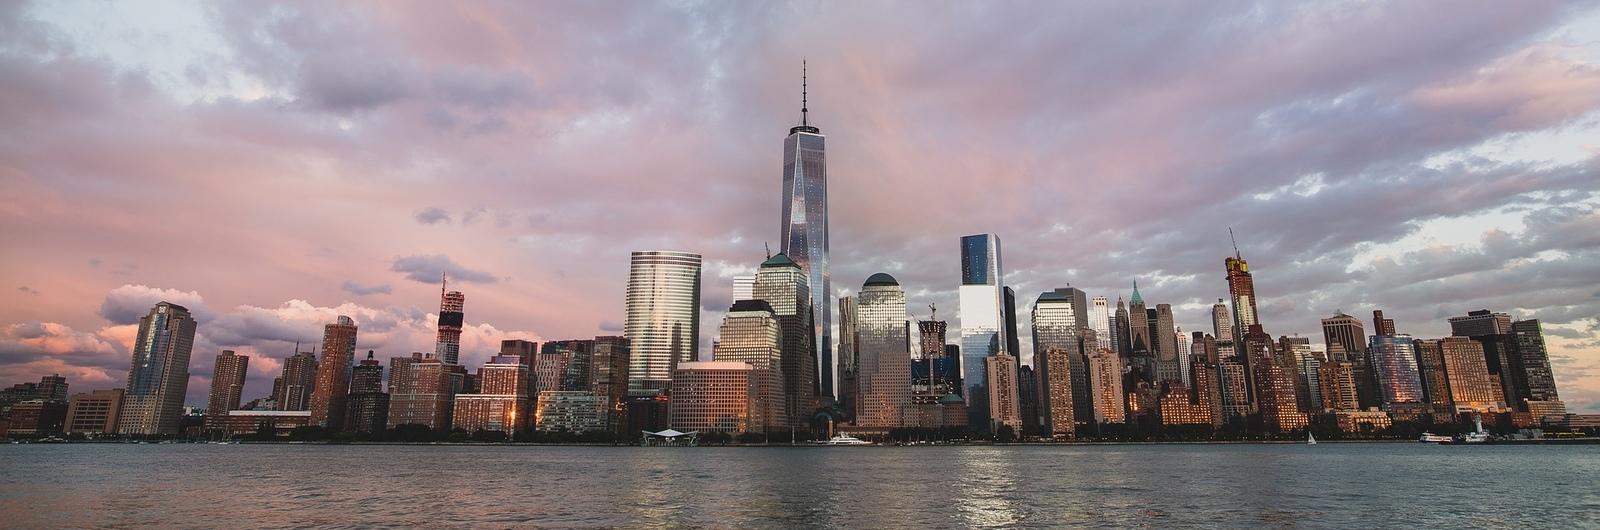 new york city header 1